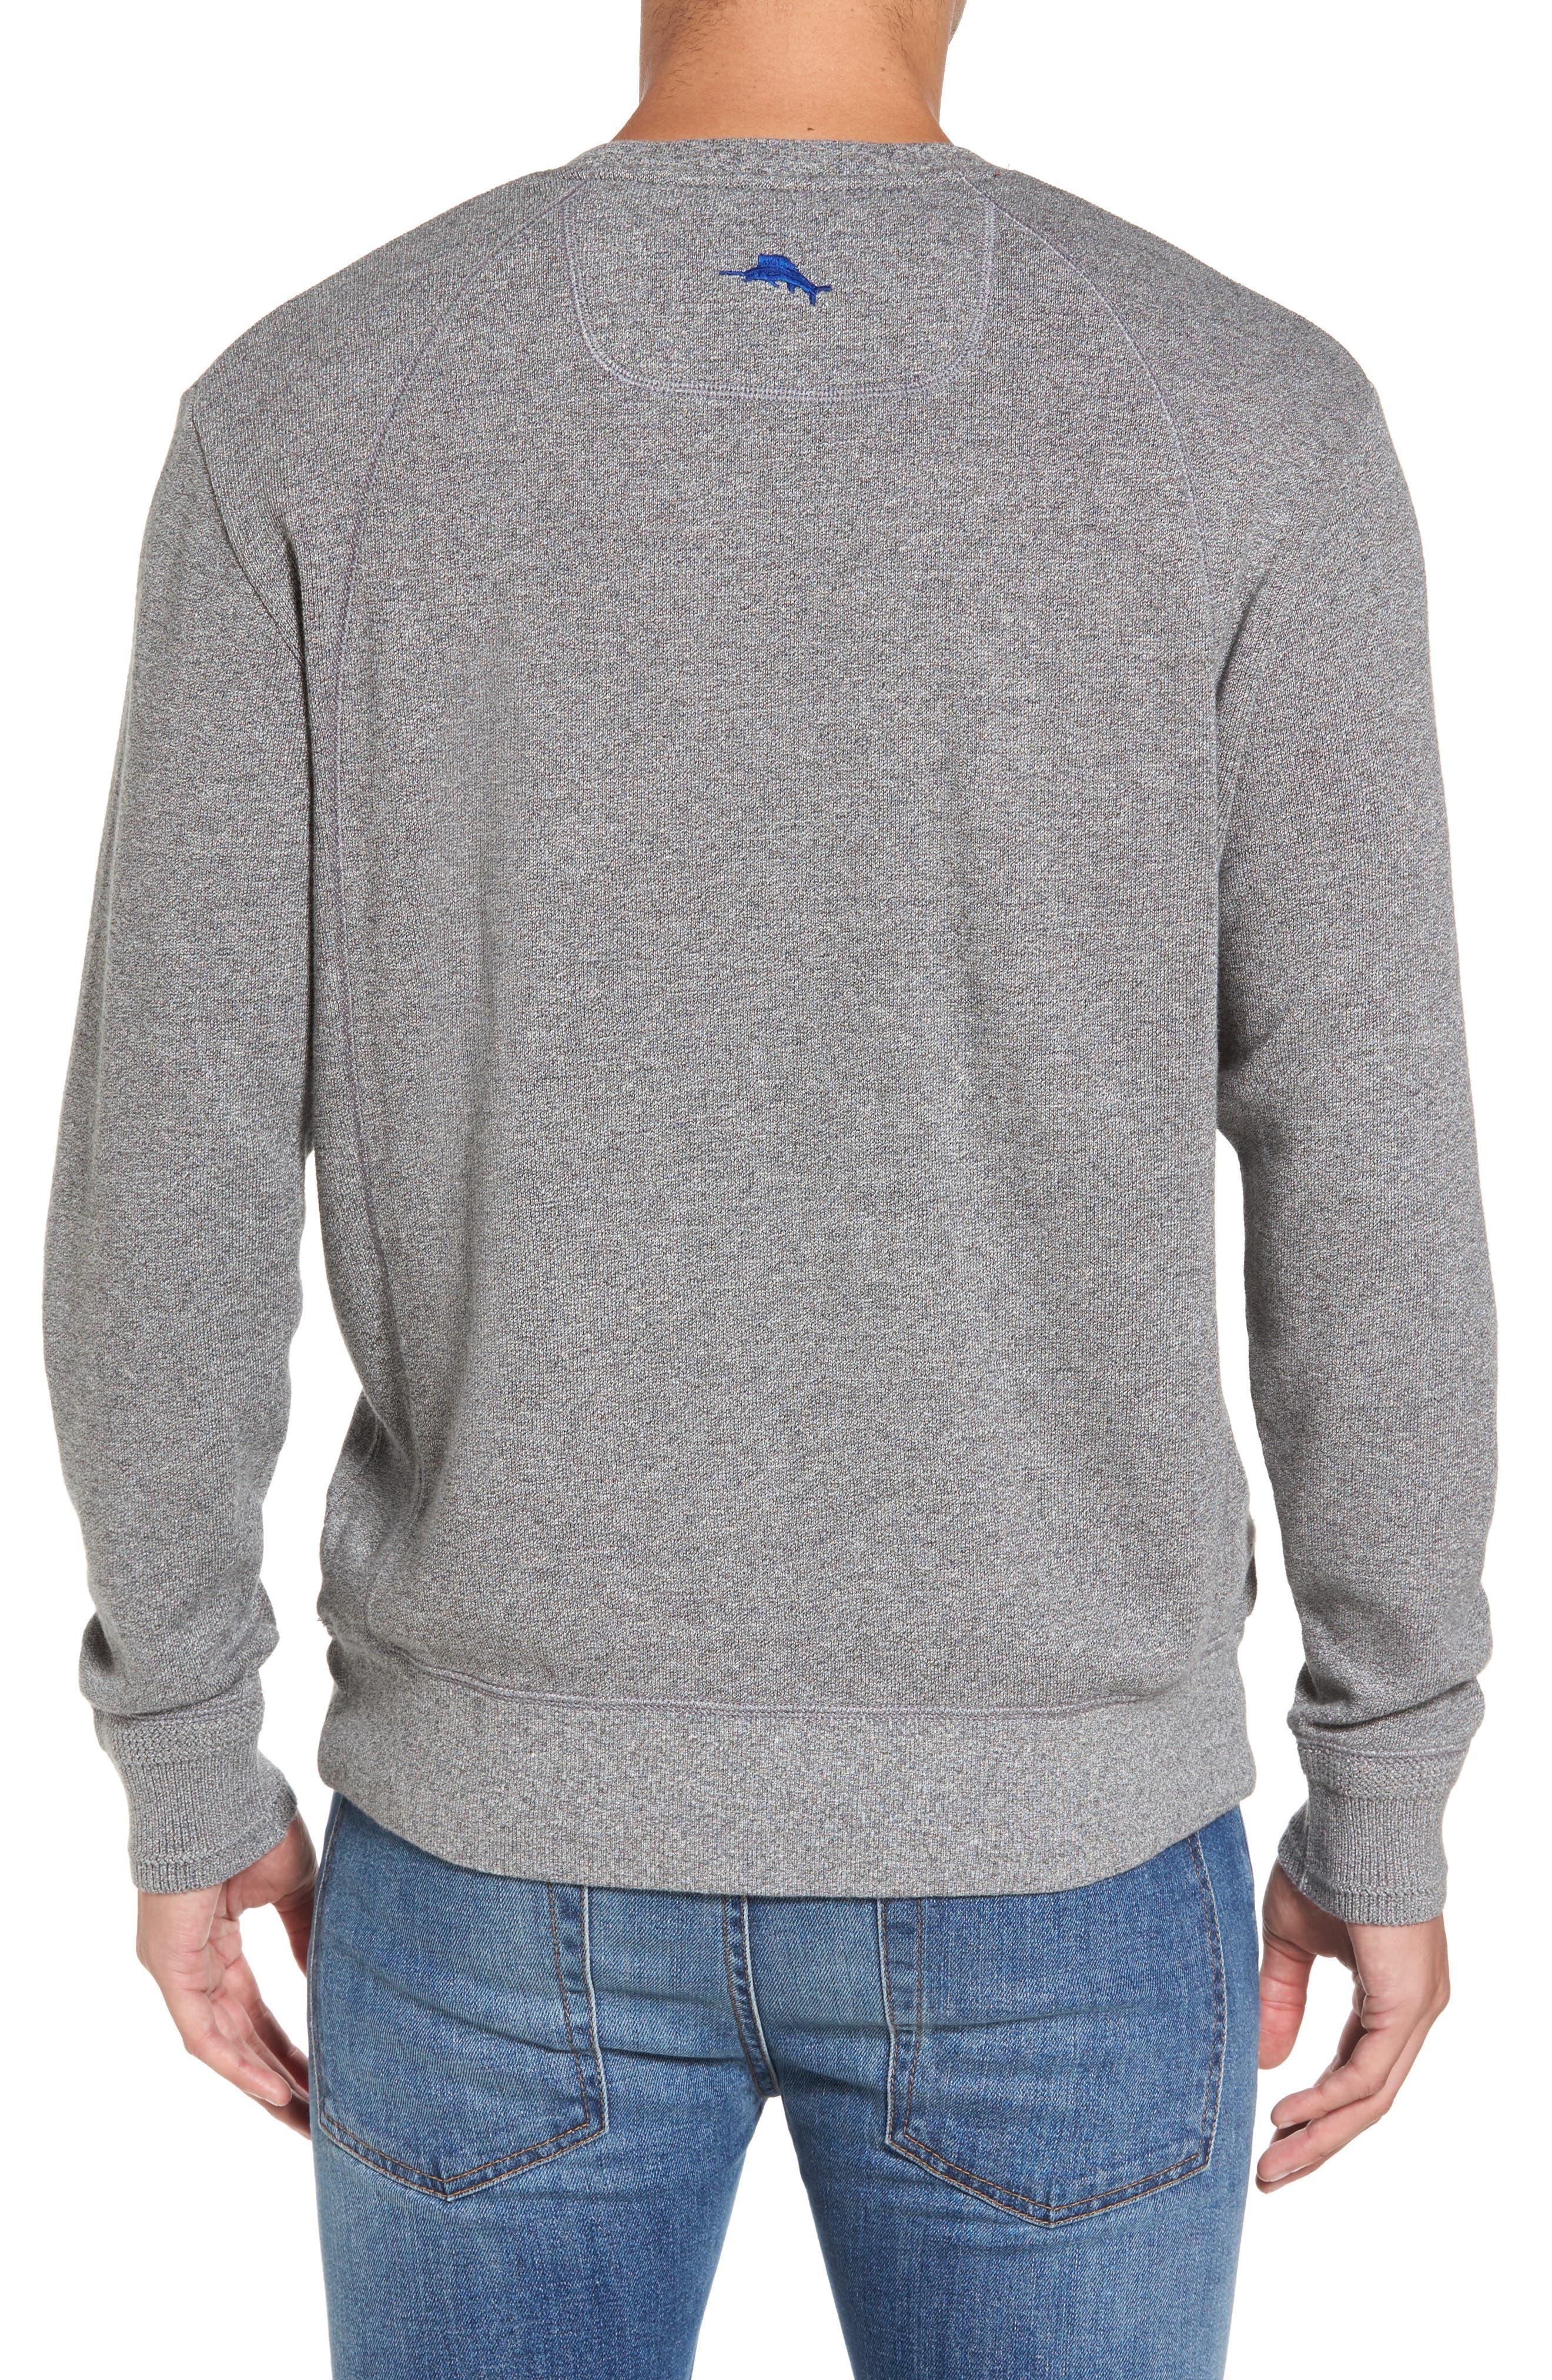 NFL Stitch of Liberty Embroidered Crewneck Sweatshirt,                             Alternate thumbnail 51, color,